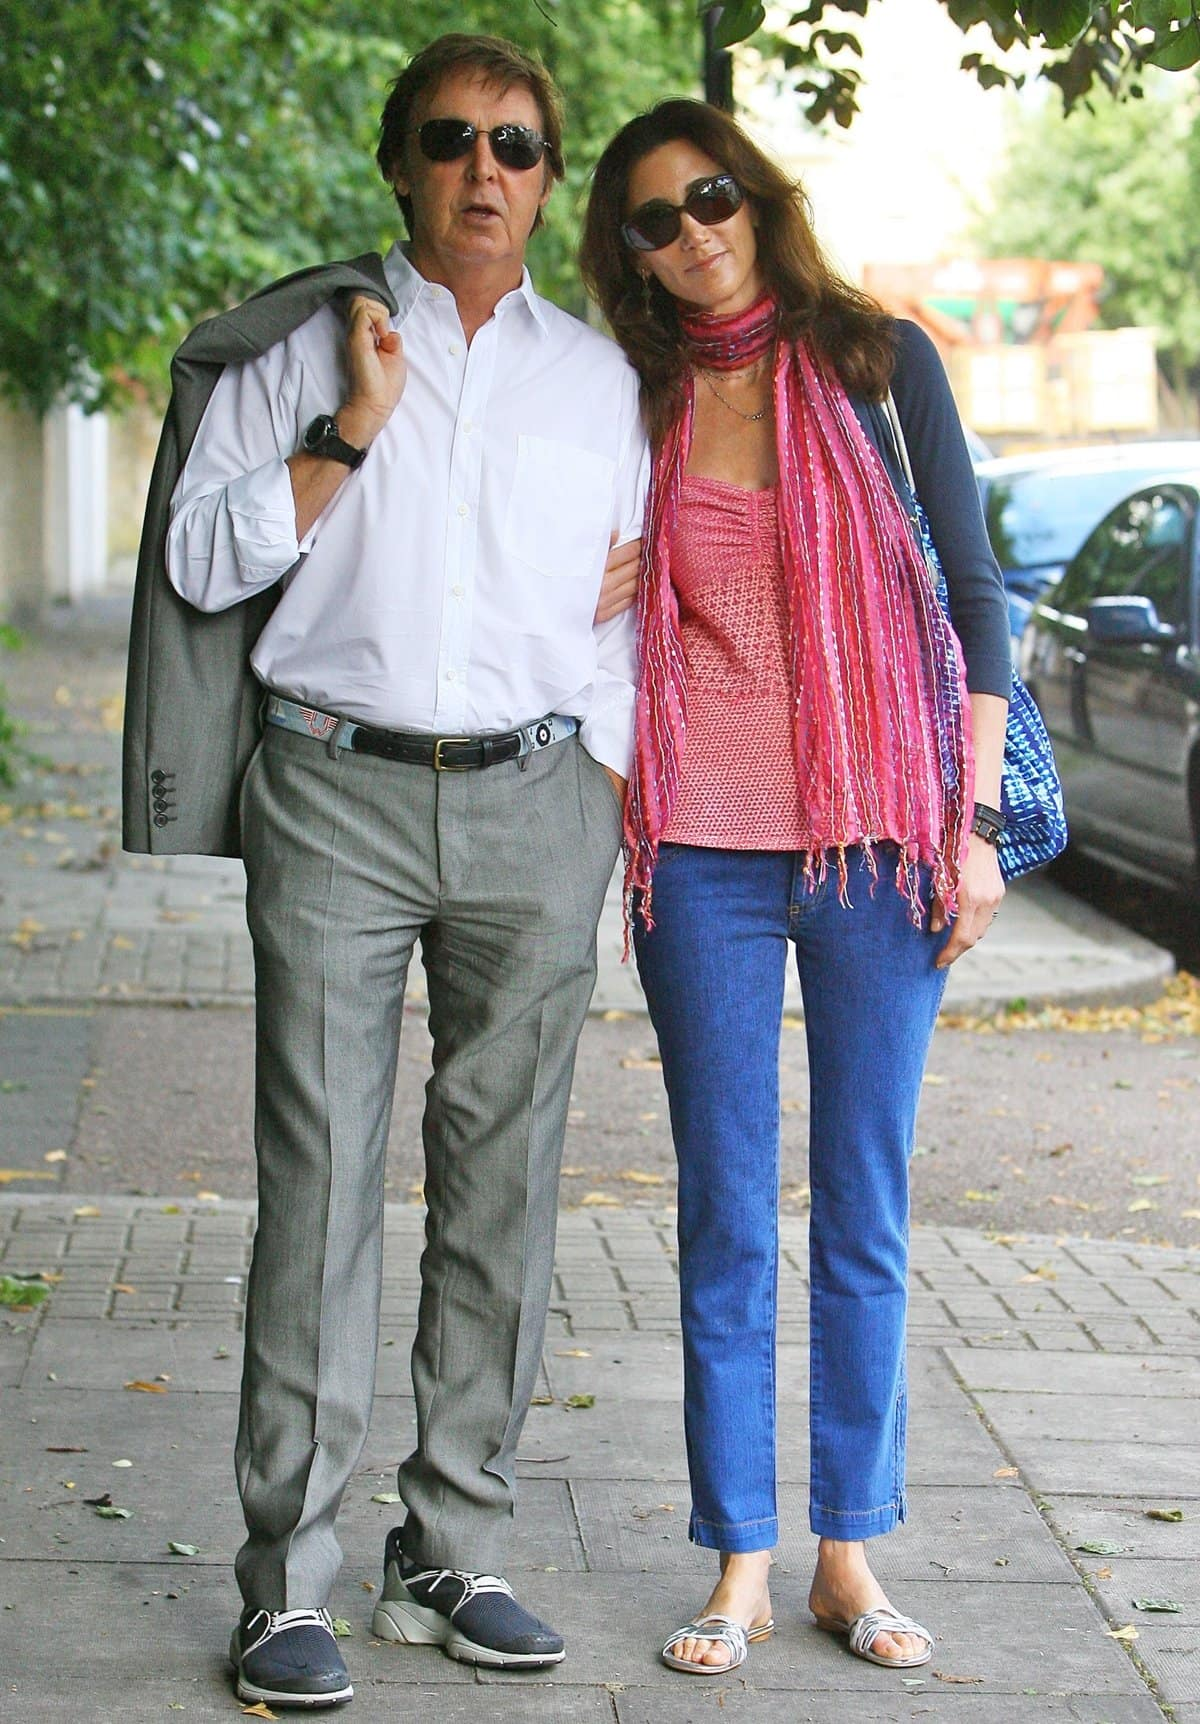 Sir Paul McCartney met his third wife Nancy Shevell in the Hamptons on Long Island